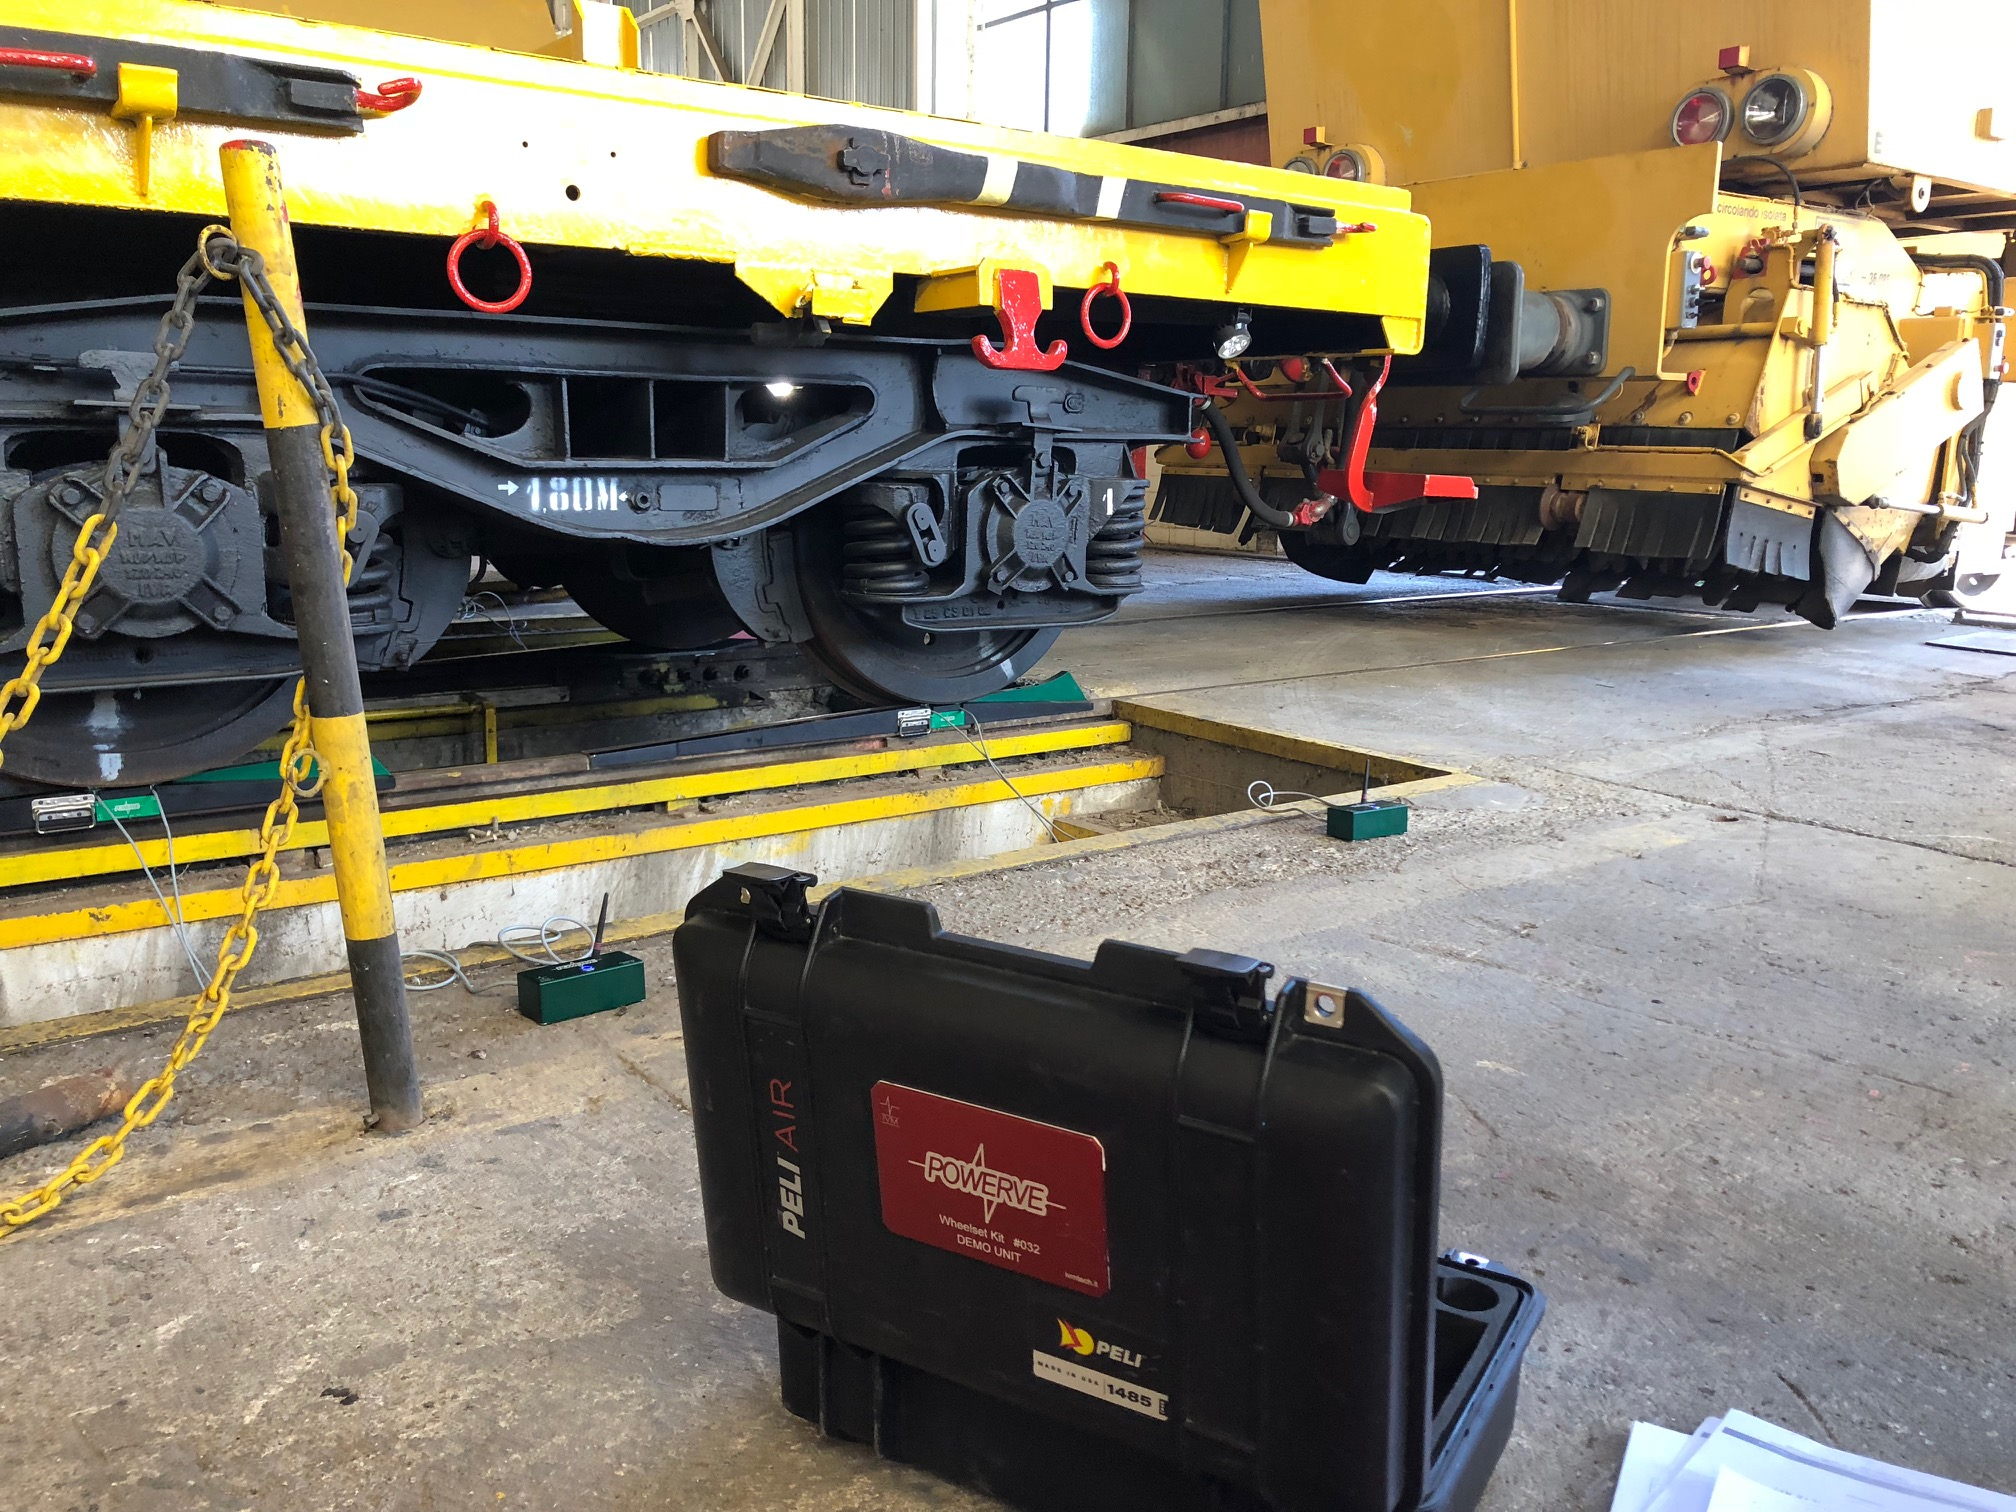 La pesa statica POWERVE nel deposito Armafer